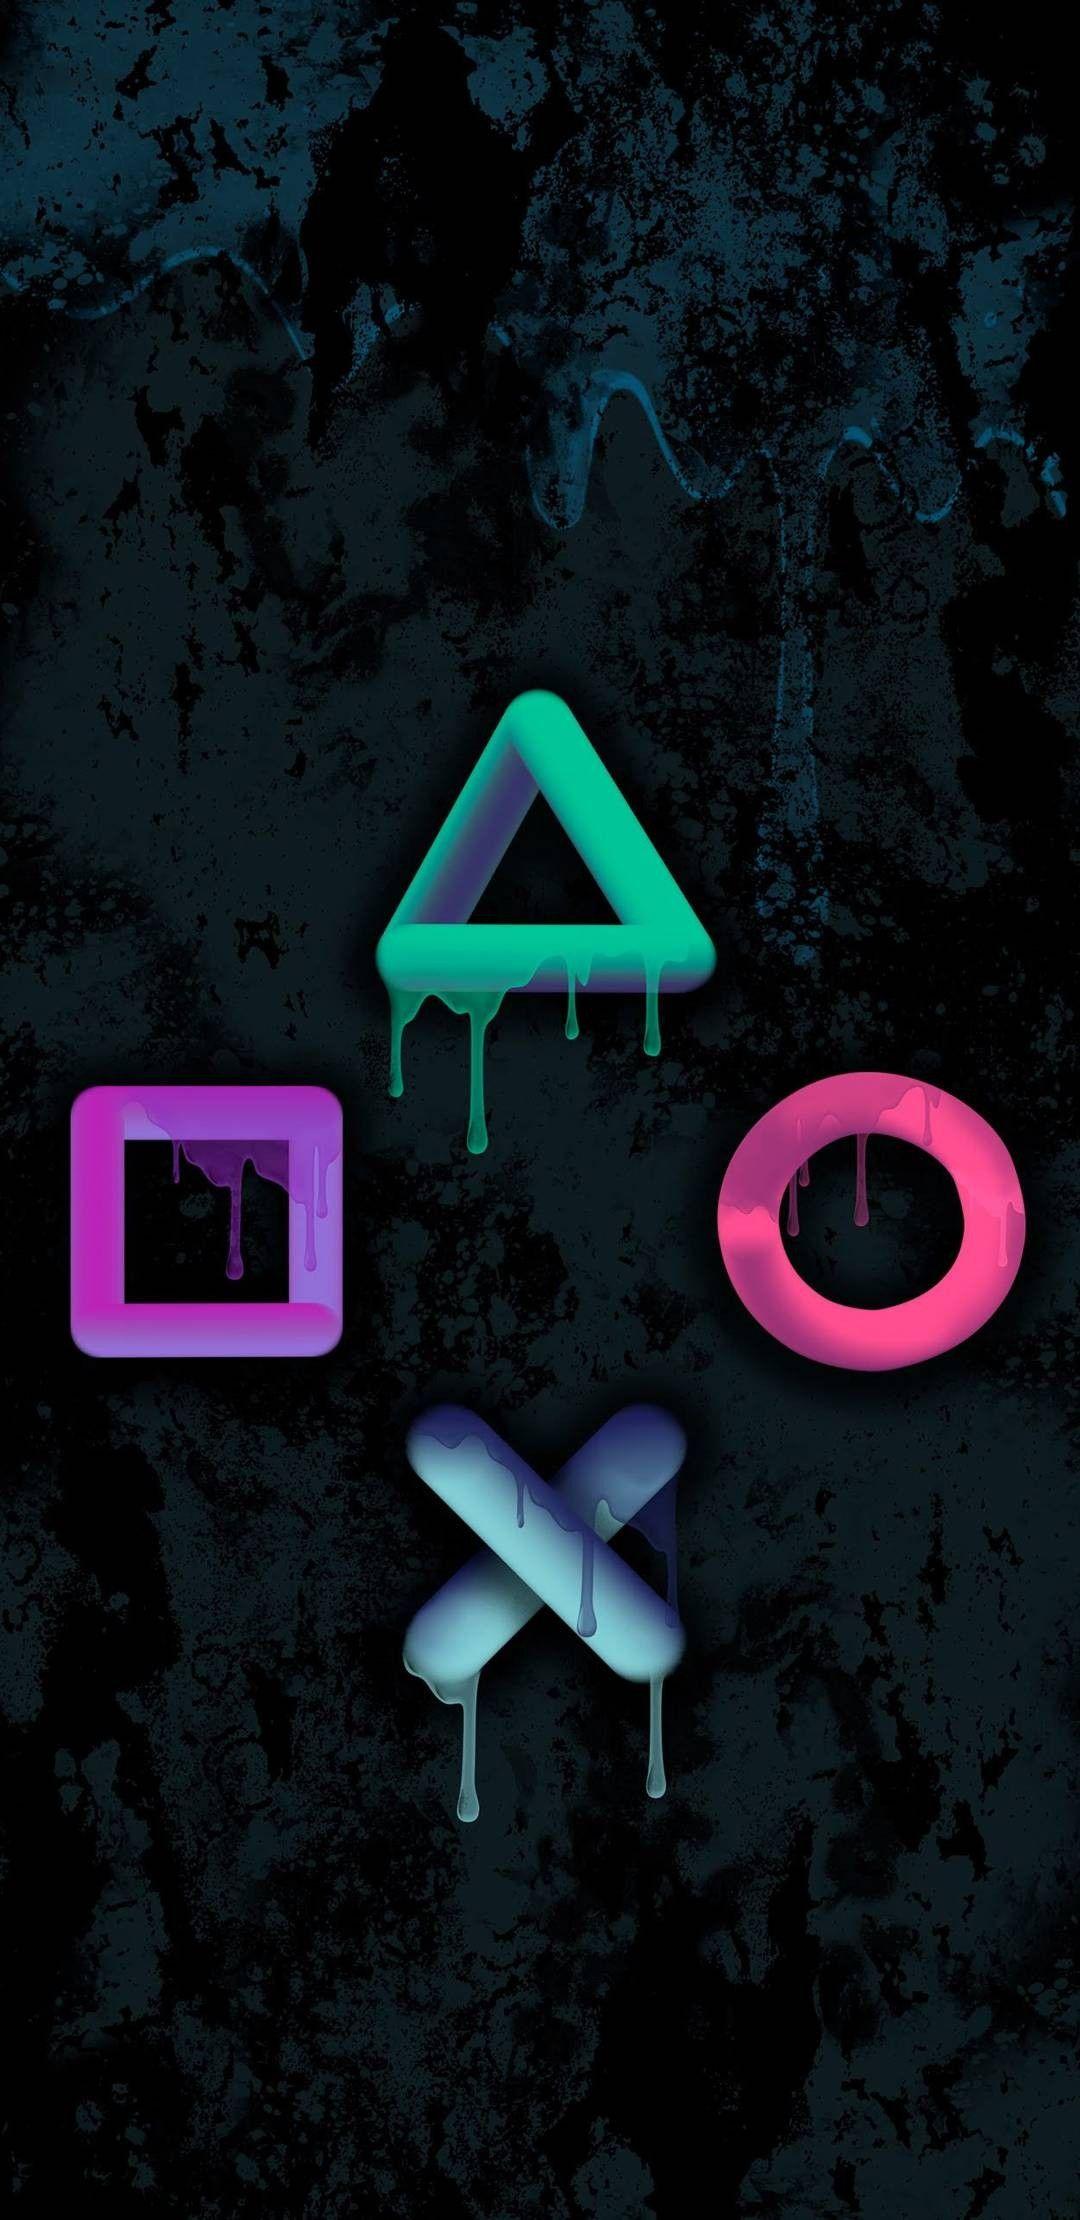 Android Papeis De Parede De Jogos Papel De Parede Games Papeis De Parede Hd Celular